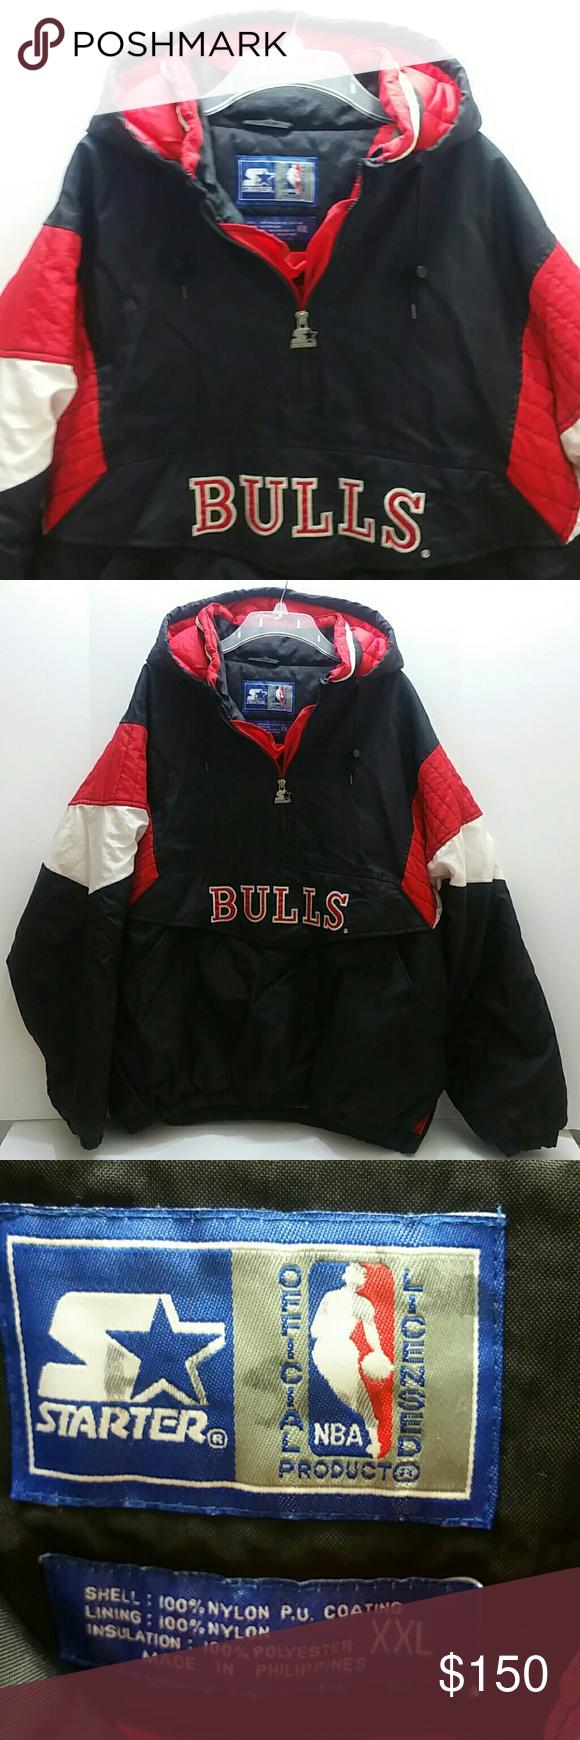 Starter Vintage Chicago Bulls Puffer Jacket Jackets Puffer Jackets Clothes Design